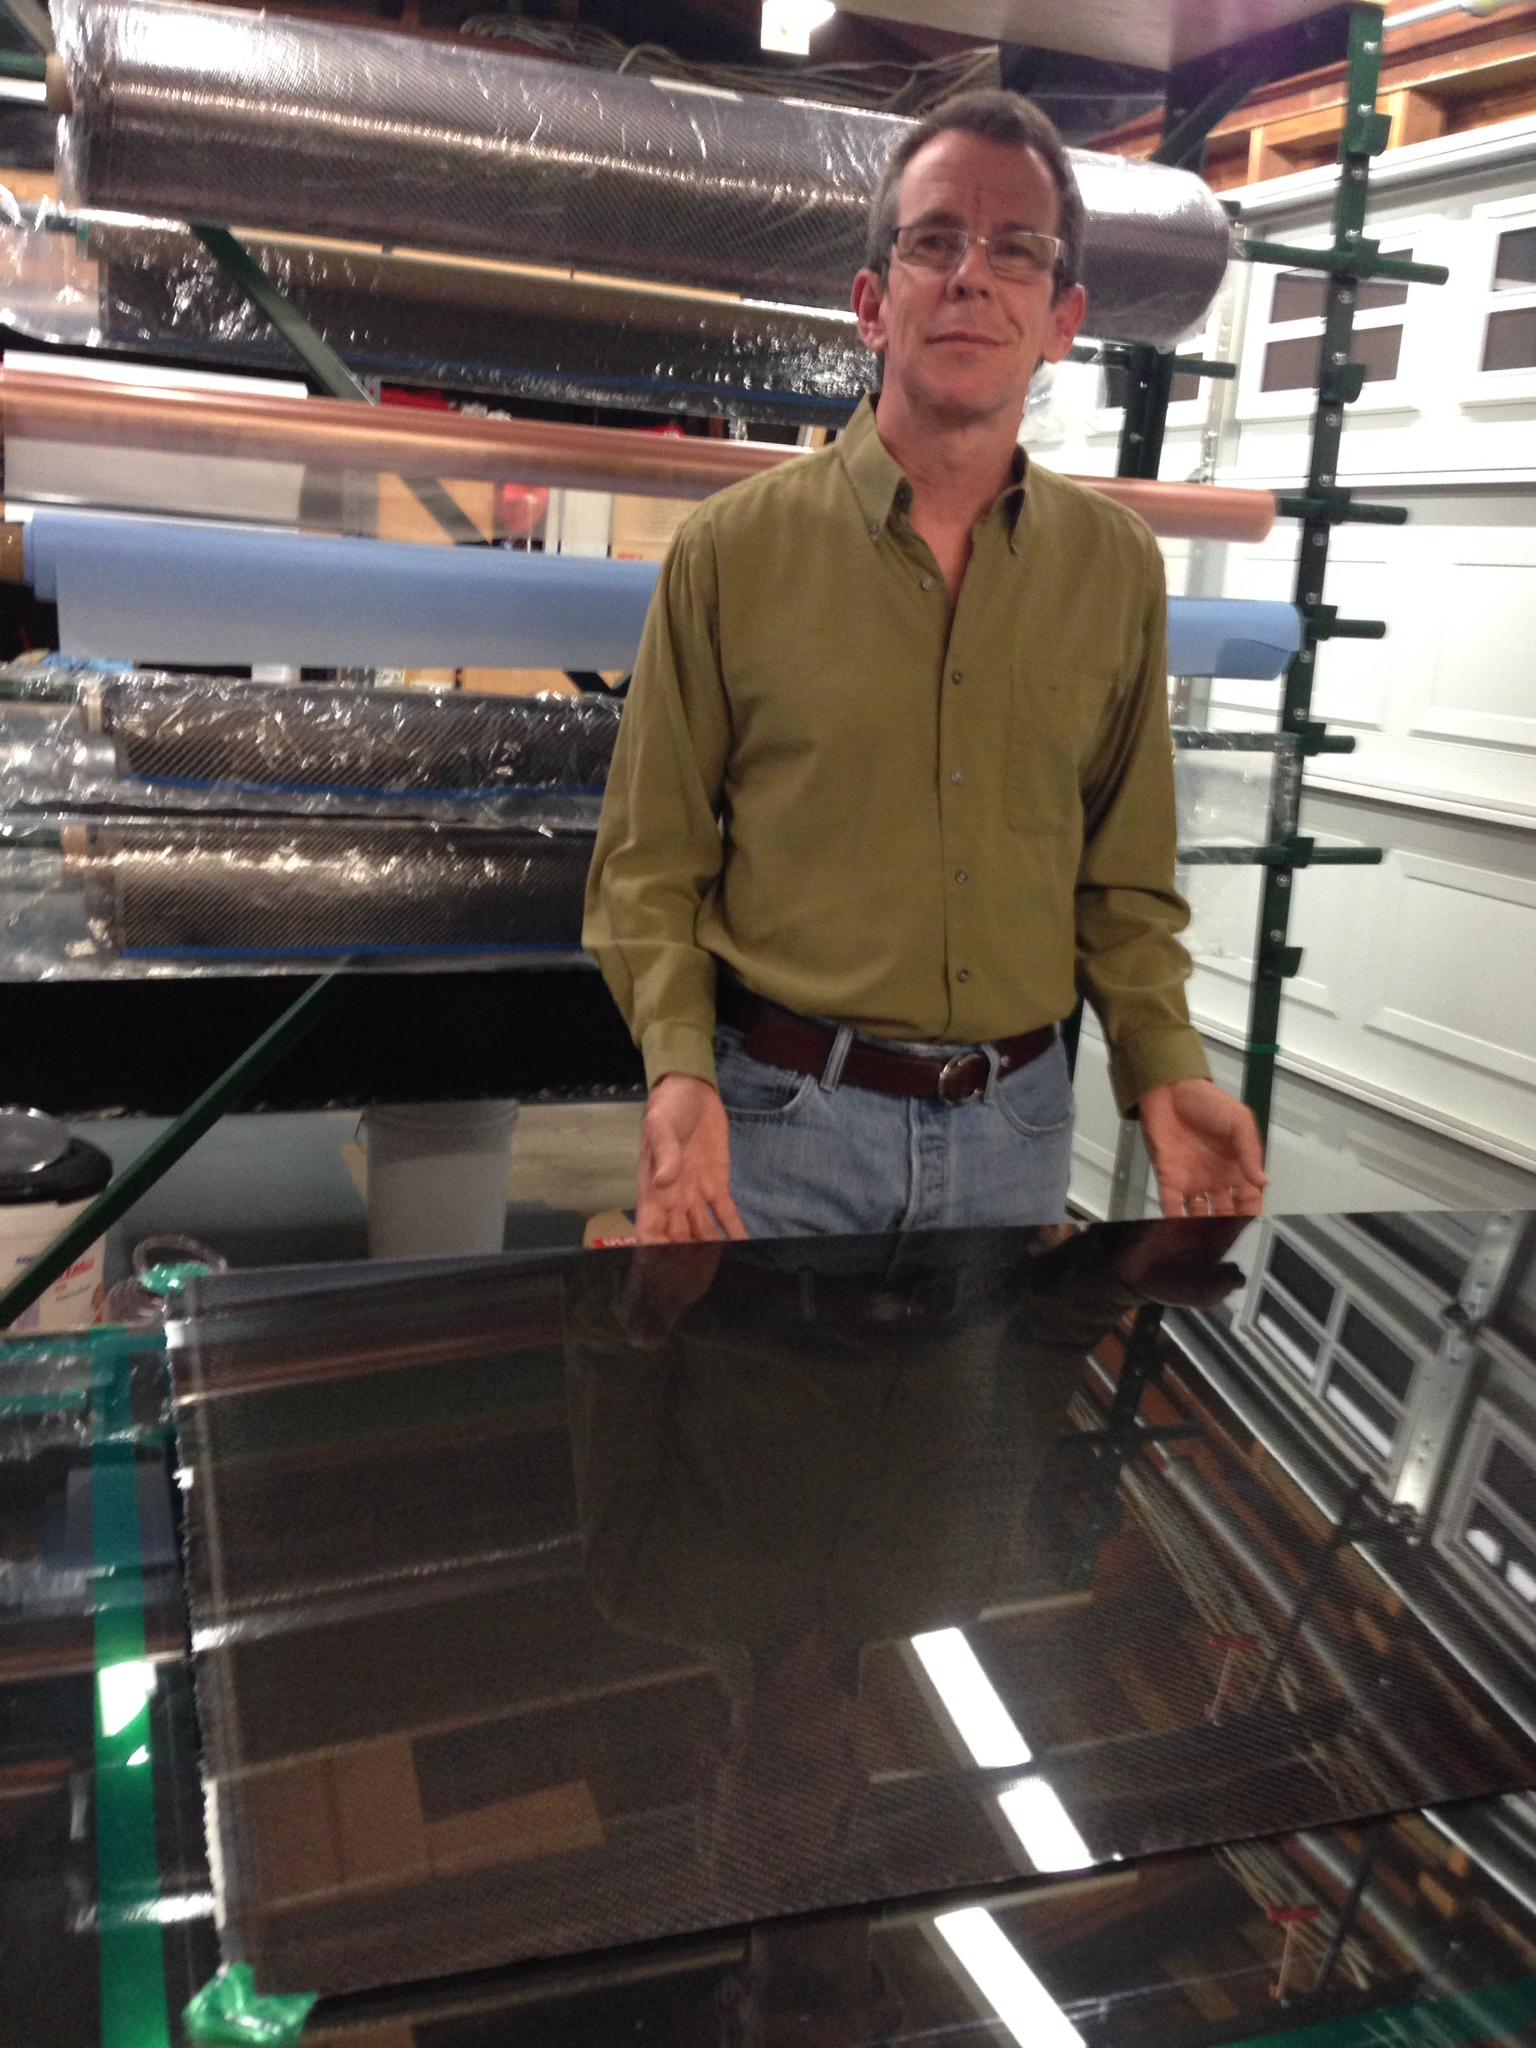 A Carbon Fiber Panel Fresh off the Mold